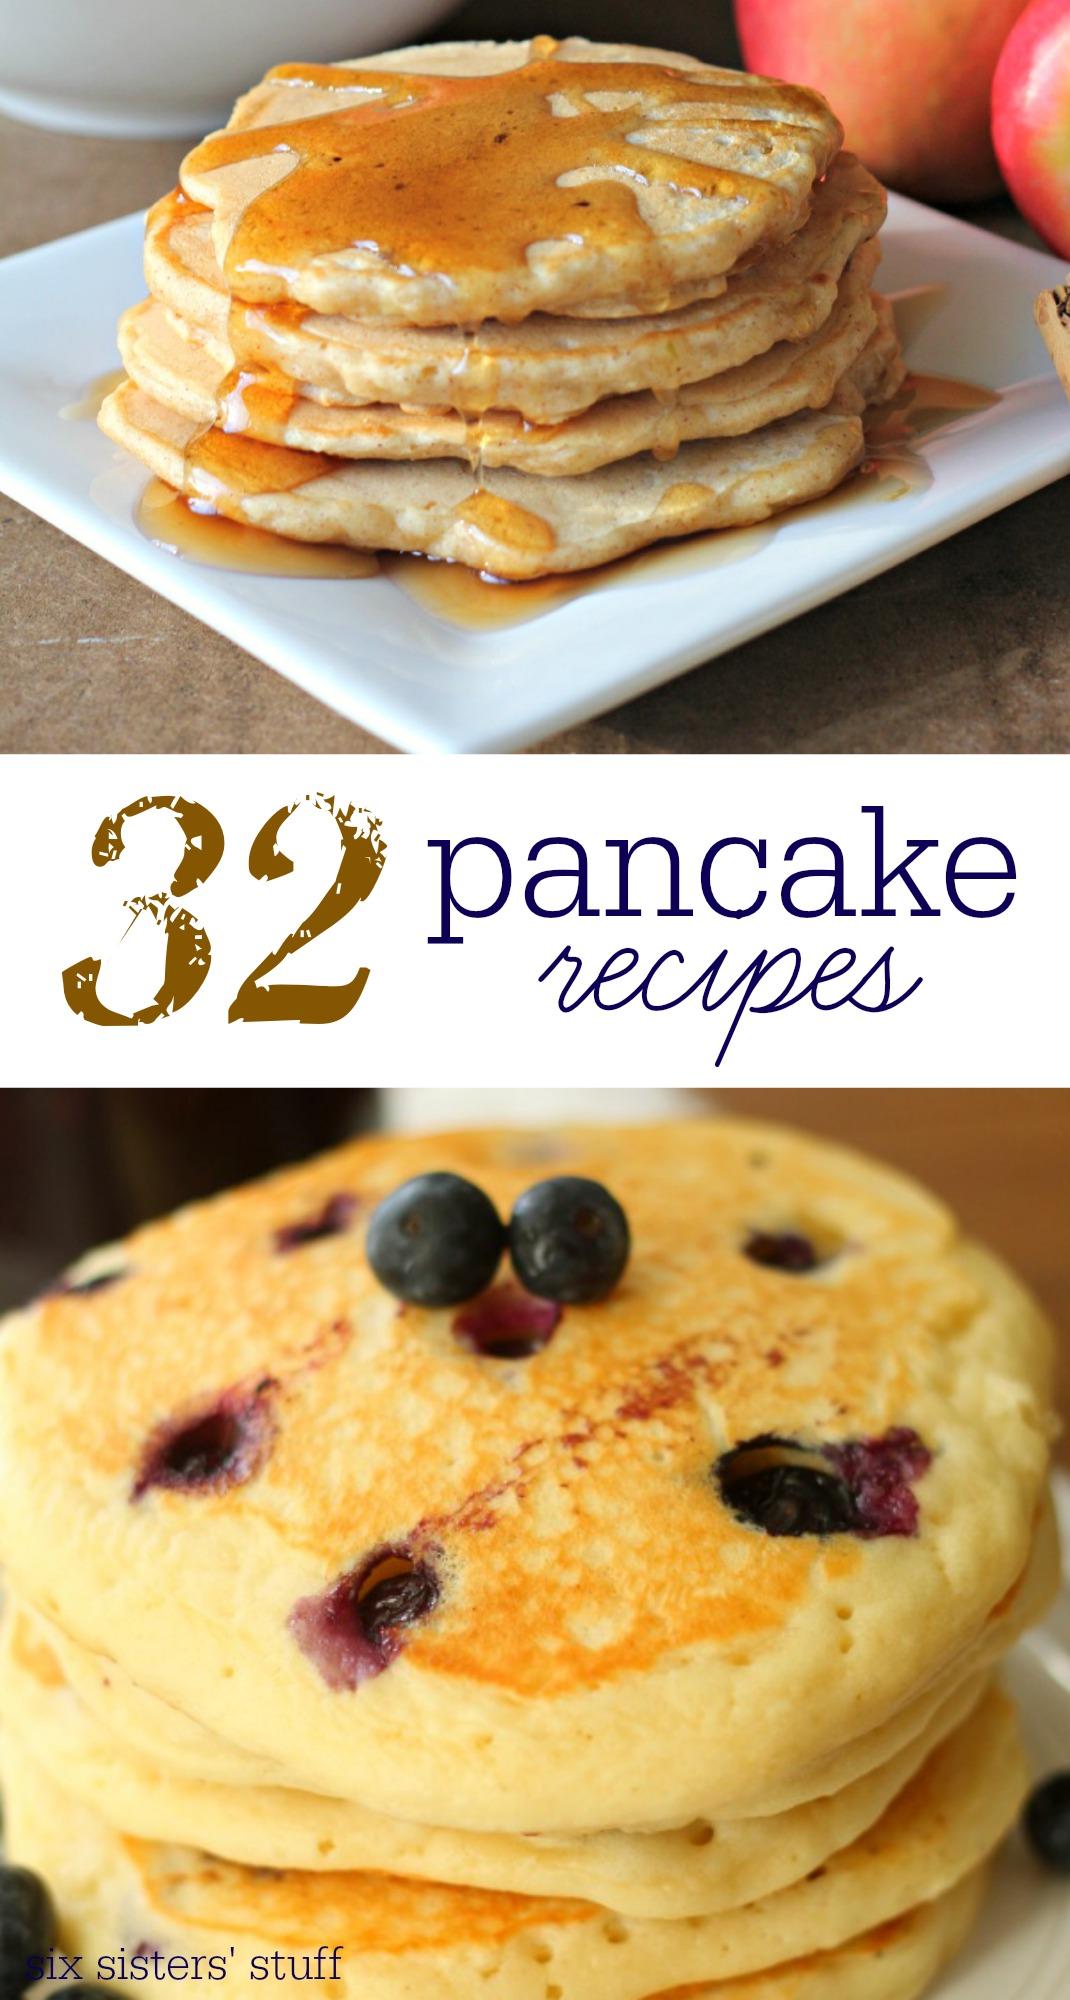 32-pancake-recipes-six-sisters